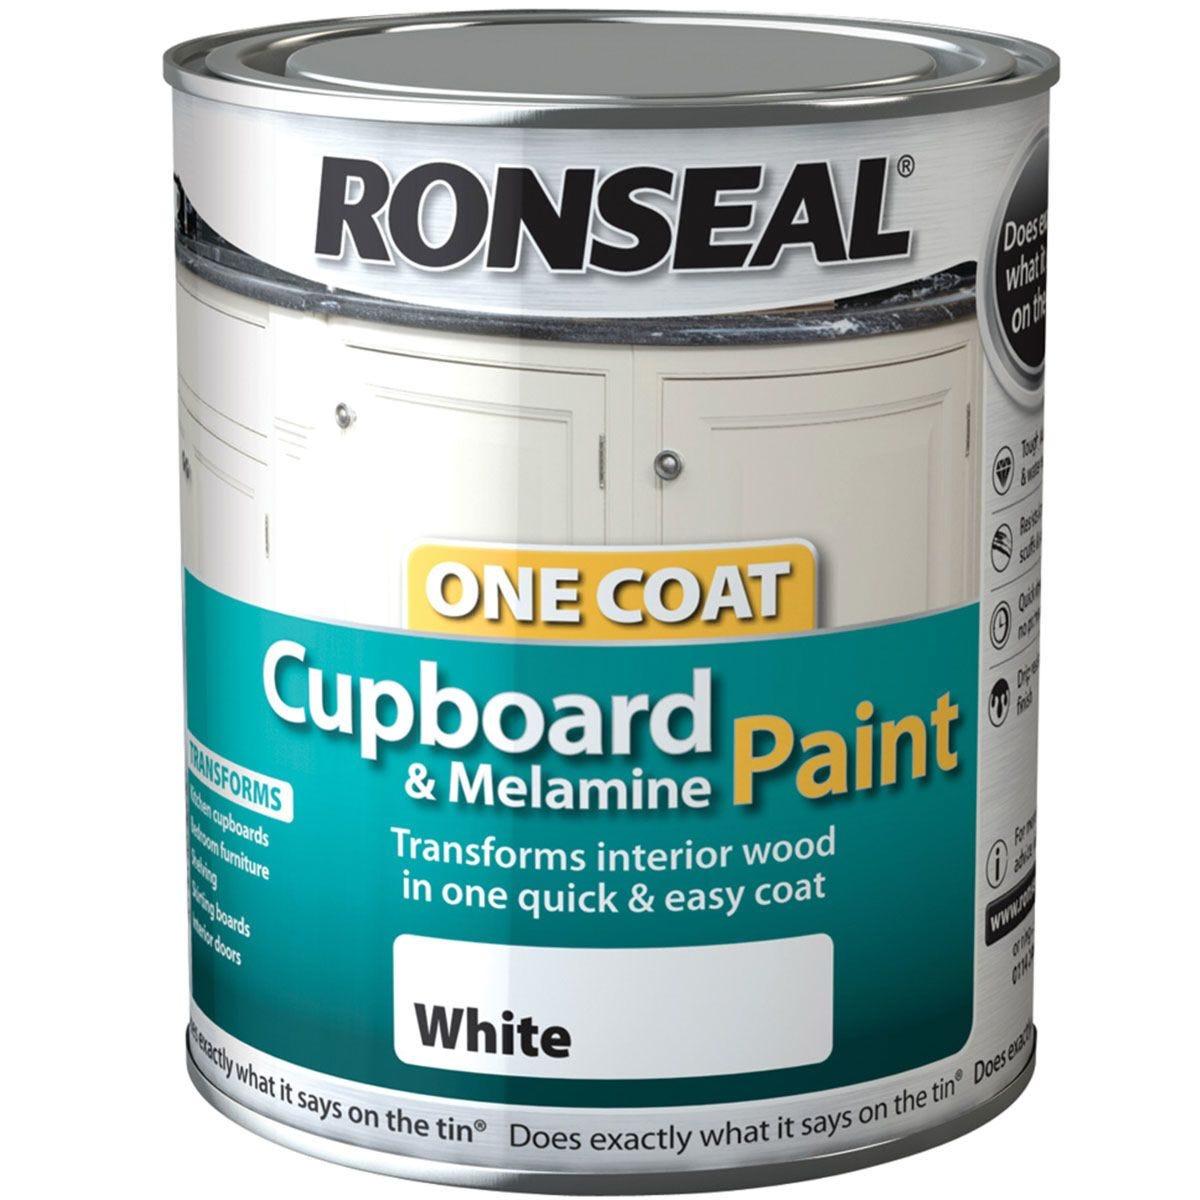 Ronseal 750ml Cupboard & Melamine Paint - White